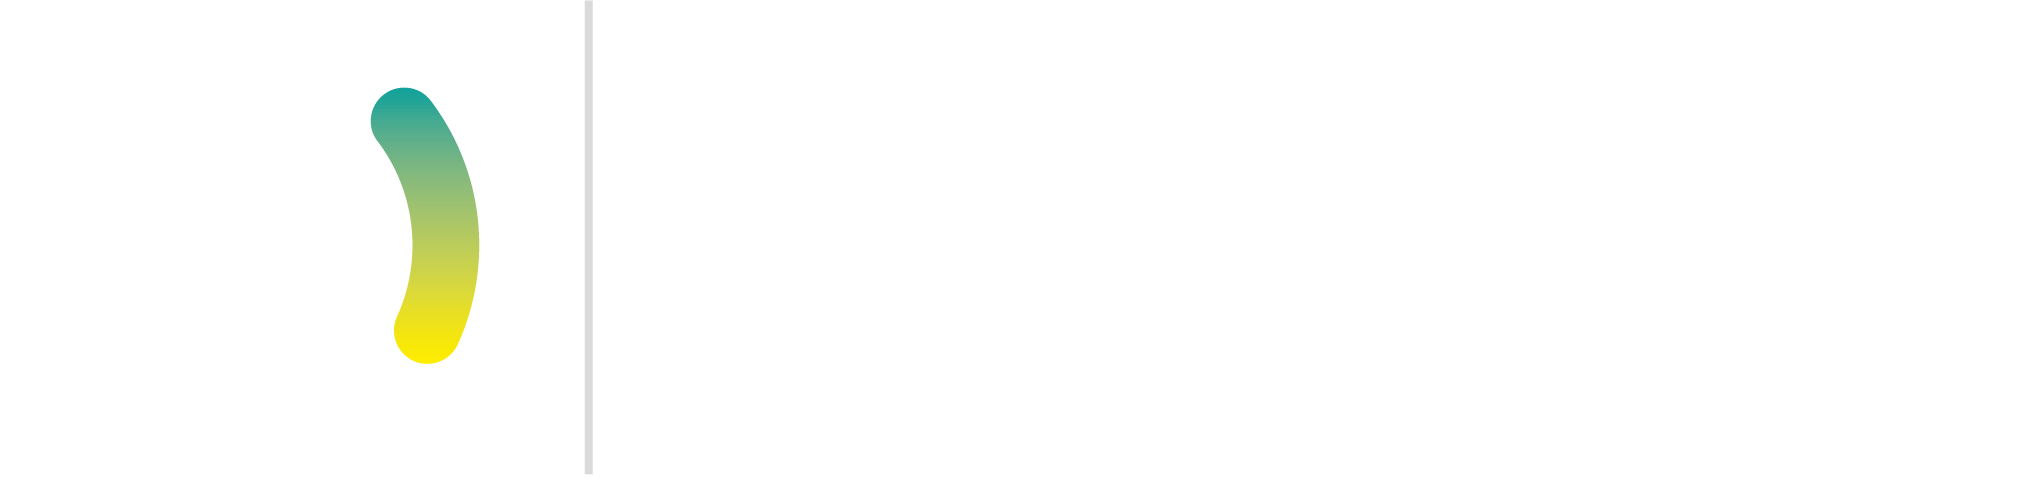 PSTM - Audit | Tax | Advisory